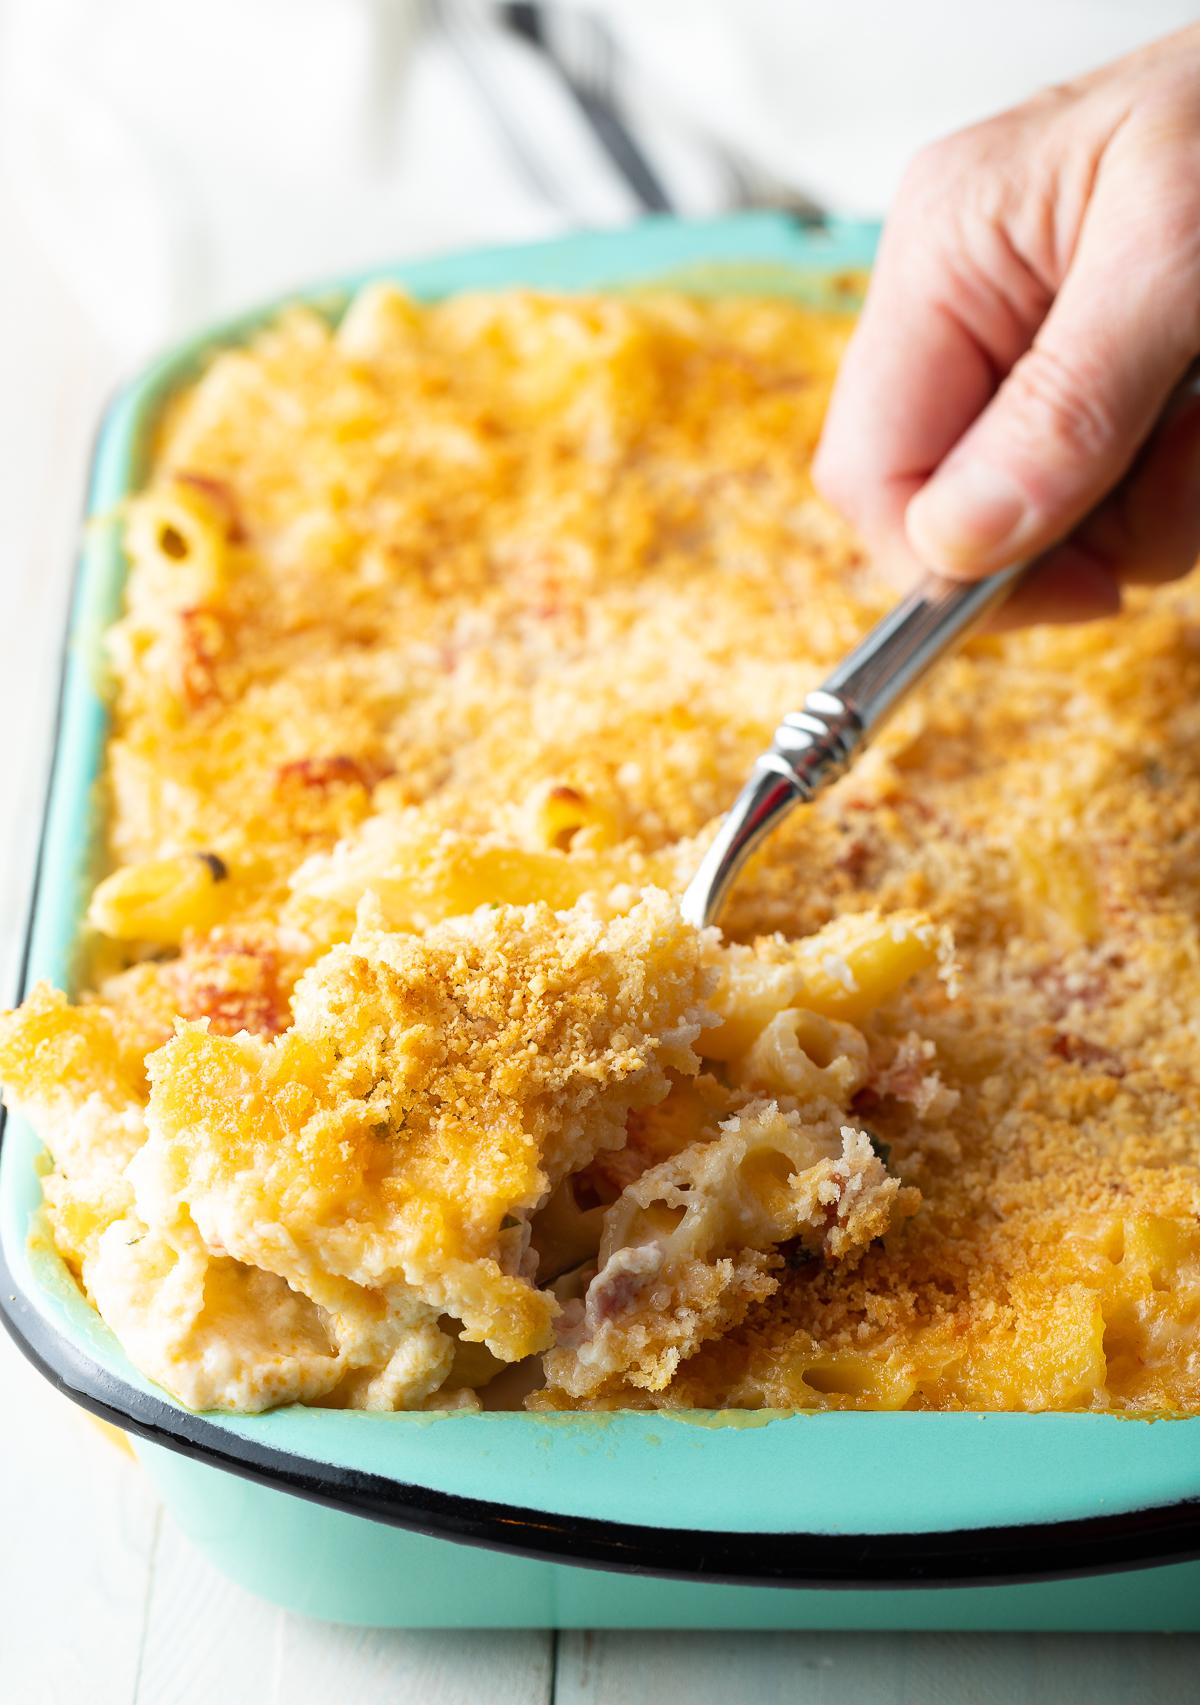 Italian Homemade Baked Mac and Cheese Recipe